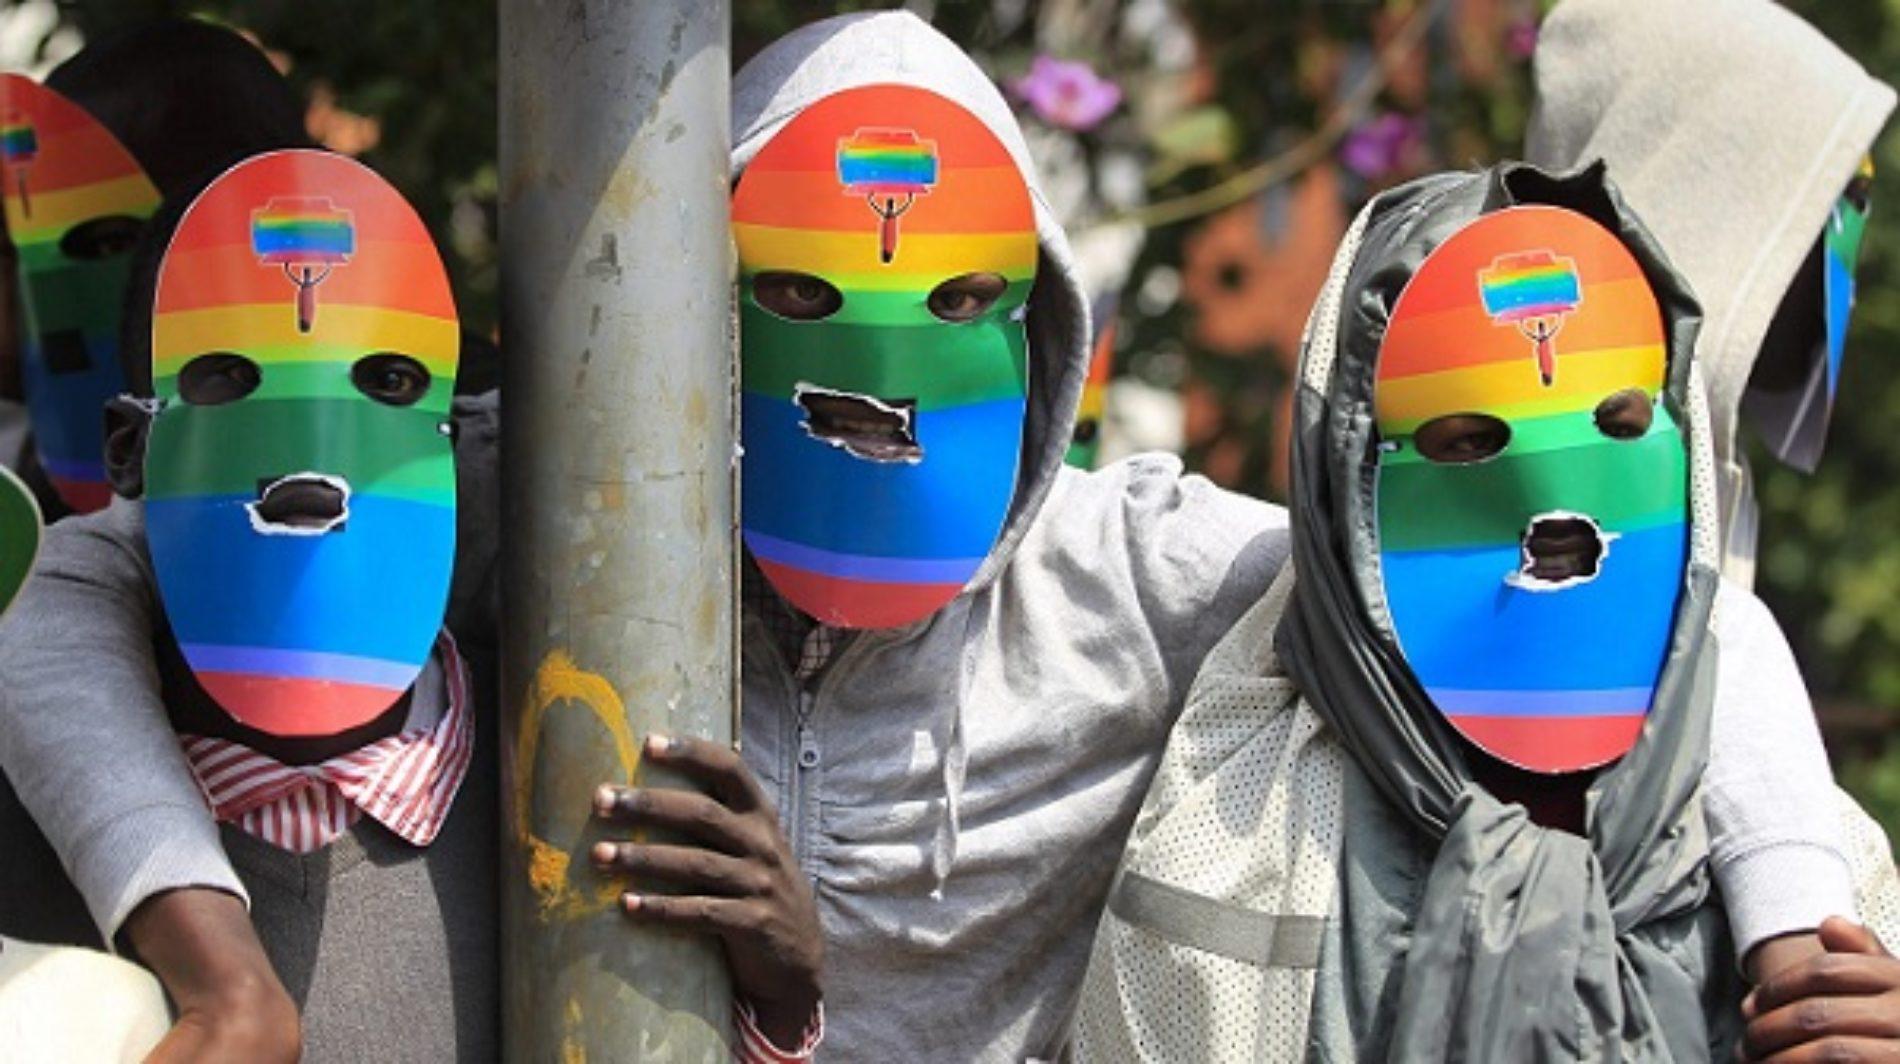 New Anti-Gay Legislation Drafted In Uganda